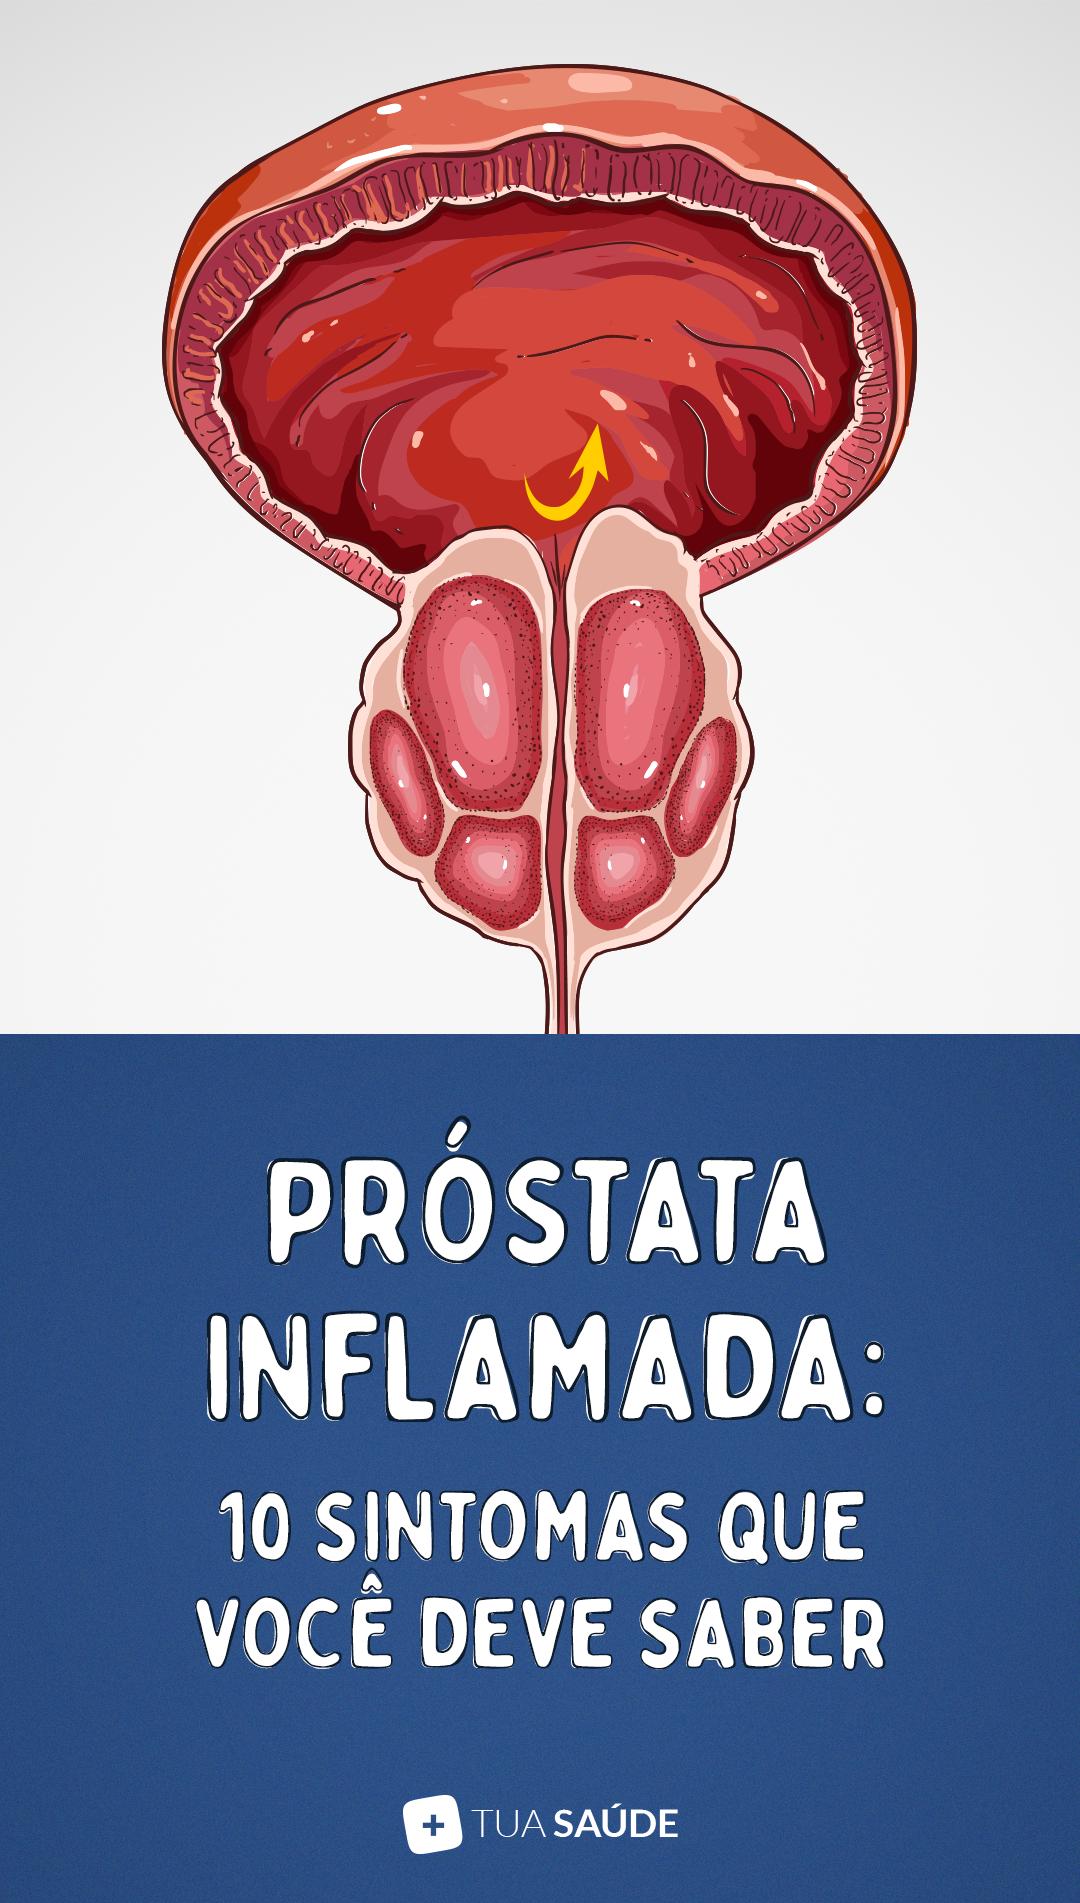 sintomas iniciais de problemas na prostata